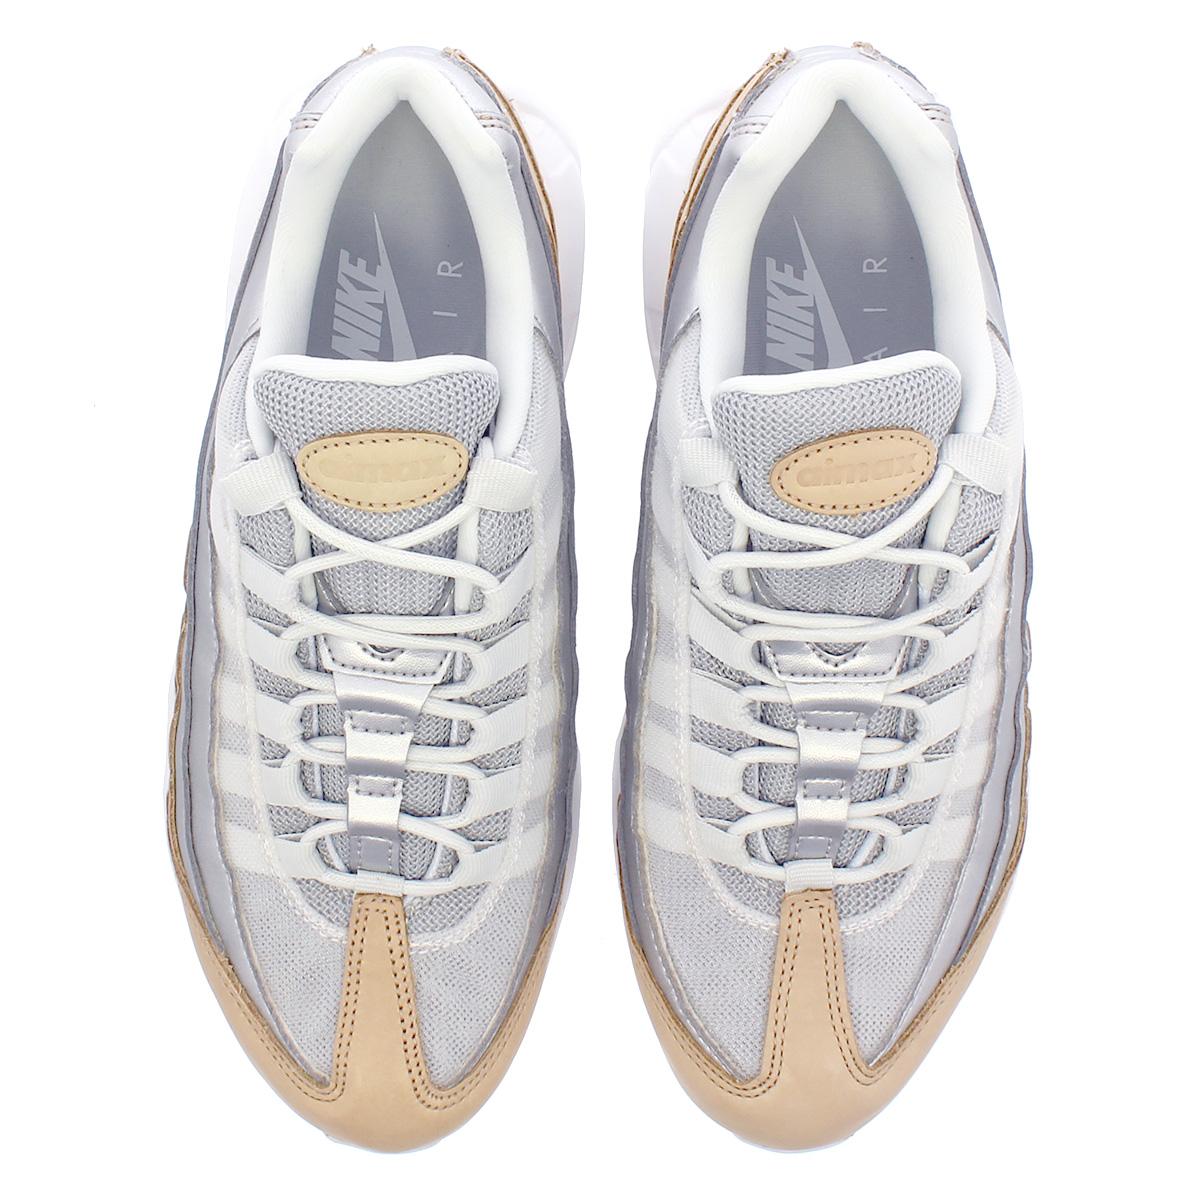 00bbd87773 ... NIKE WMNS AIR MAX 95 SE PRM Nike women Air Max 95 SE premium PURE  PLATINUM ...